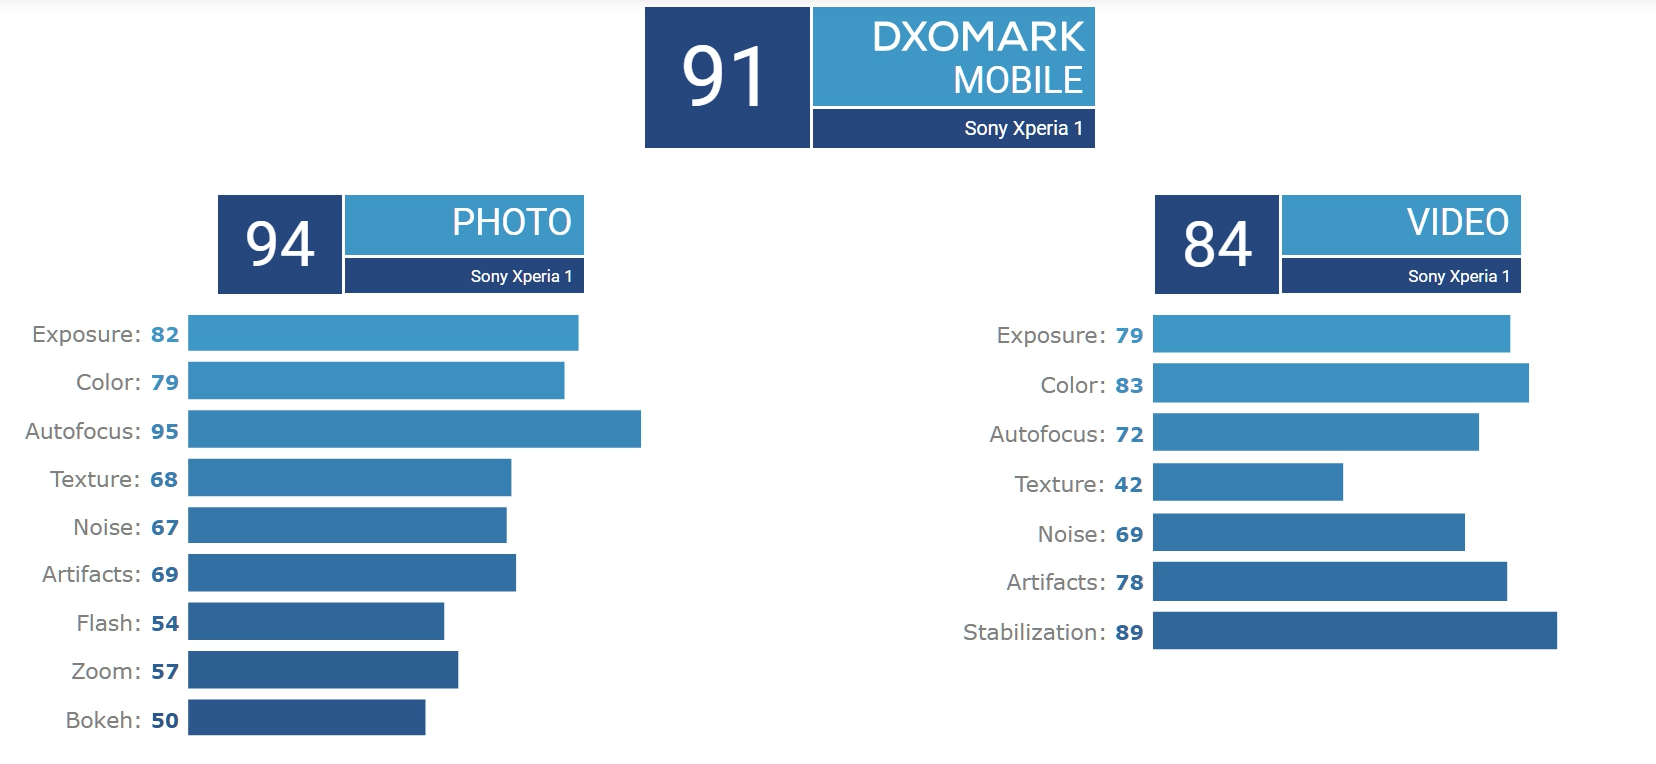 Sony Xperia 1 DxO主相機各項細部得分